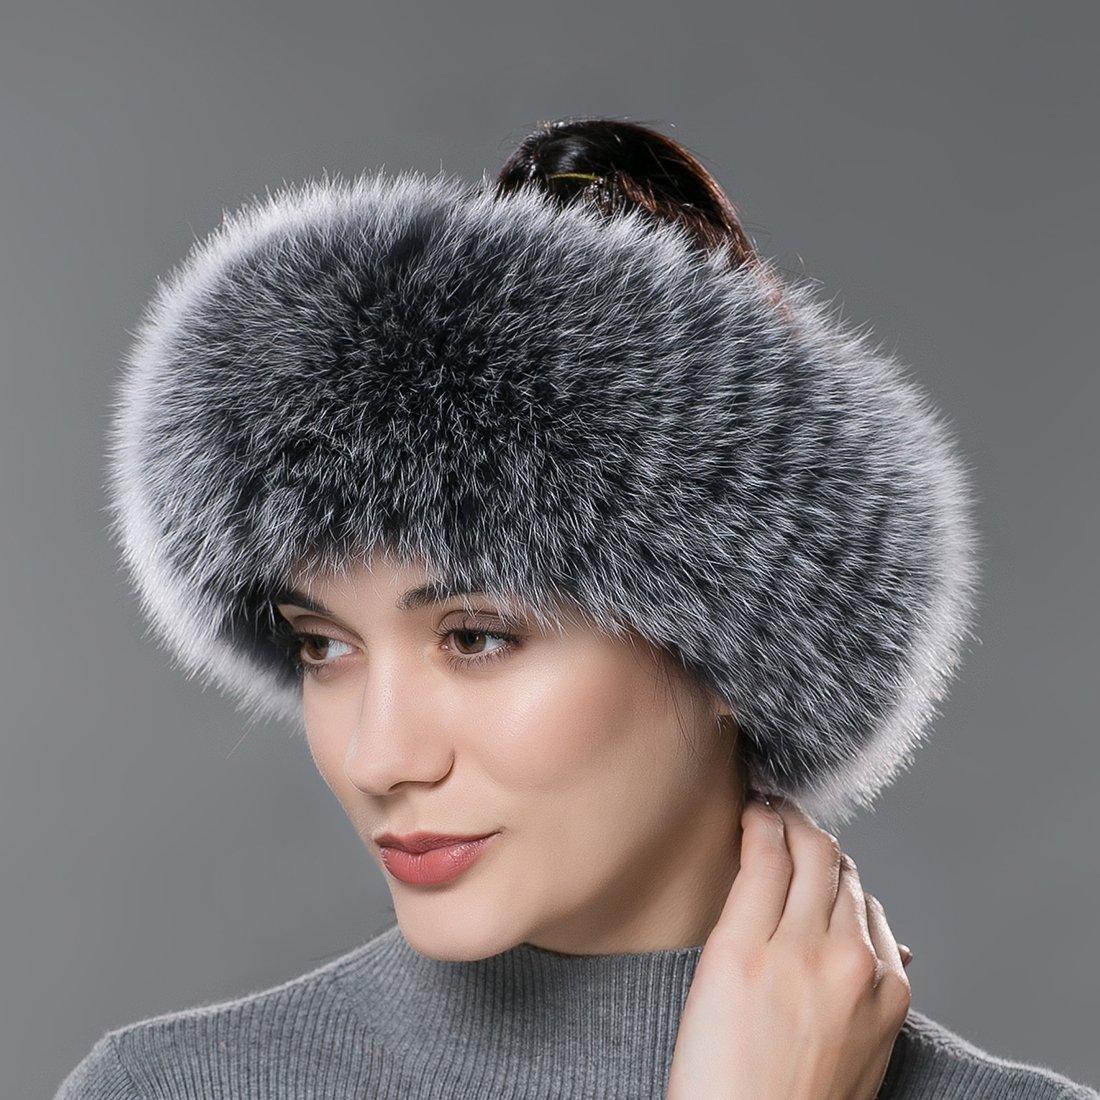 URSFUR Winter Fur Headband Women Warm Real Fox Fur Knitted Headband Earmuffs Gray Frost by URSFUR (Image #4)